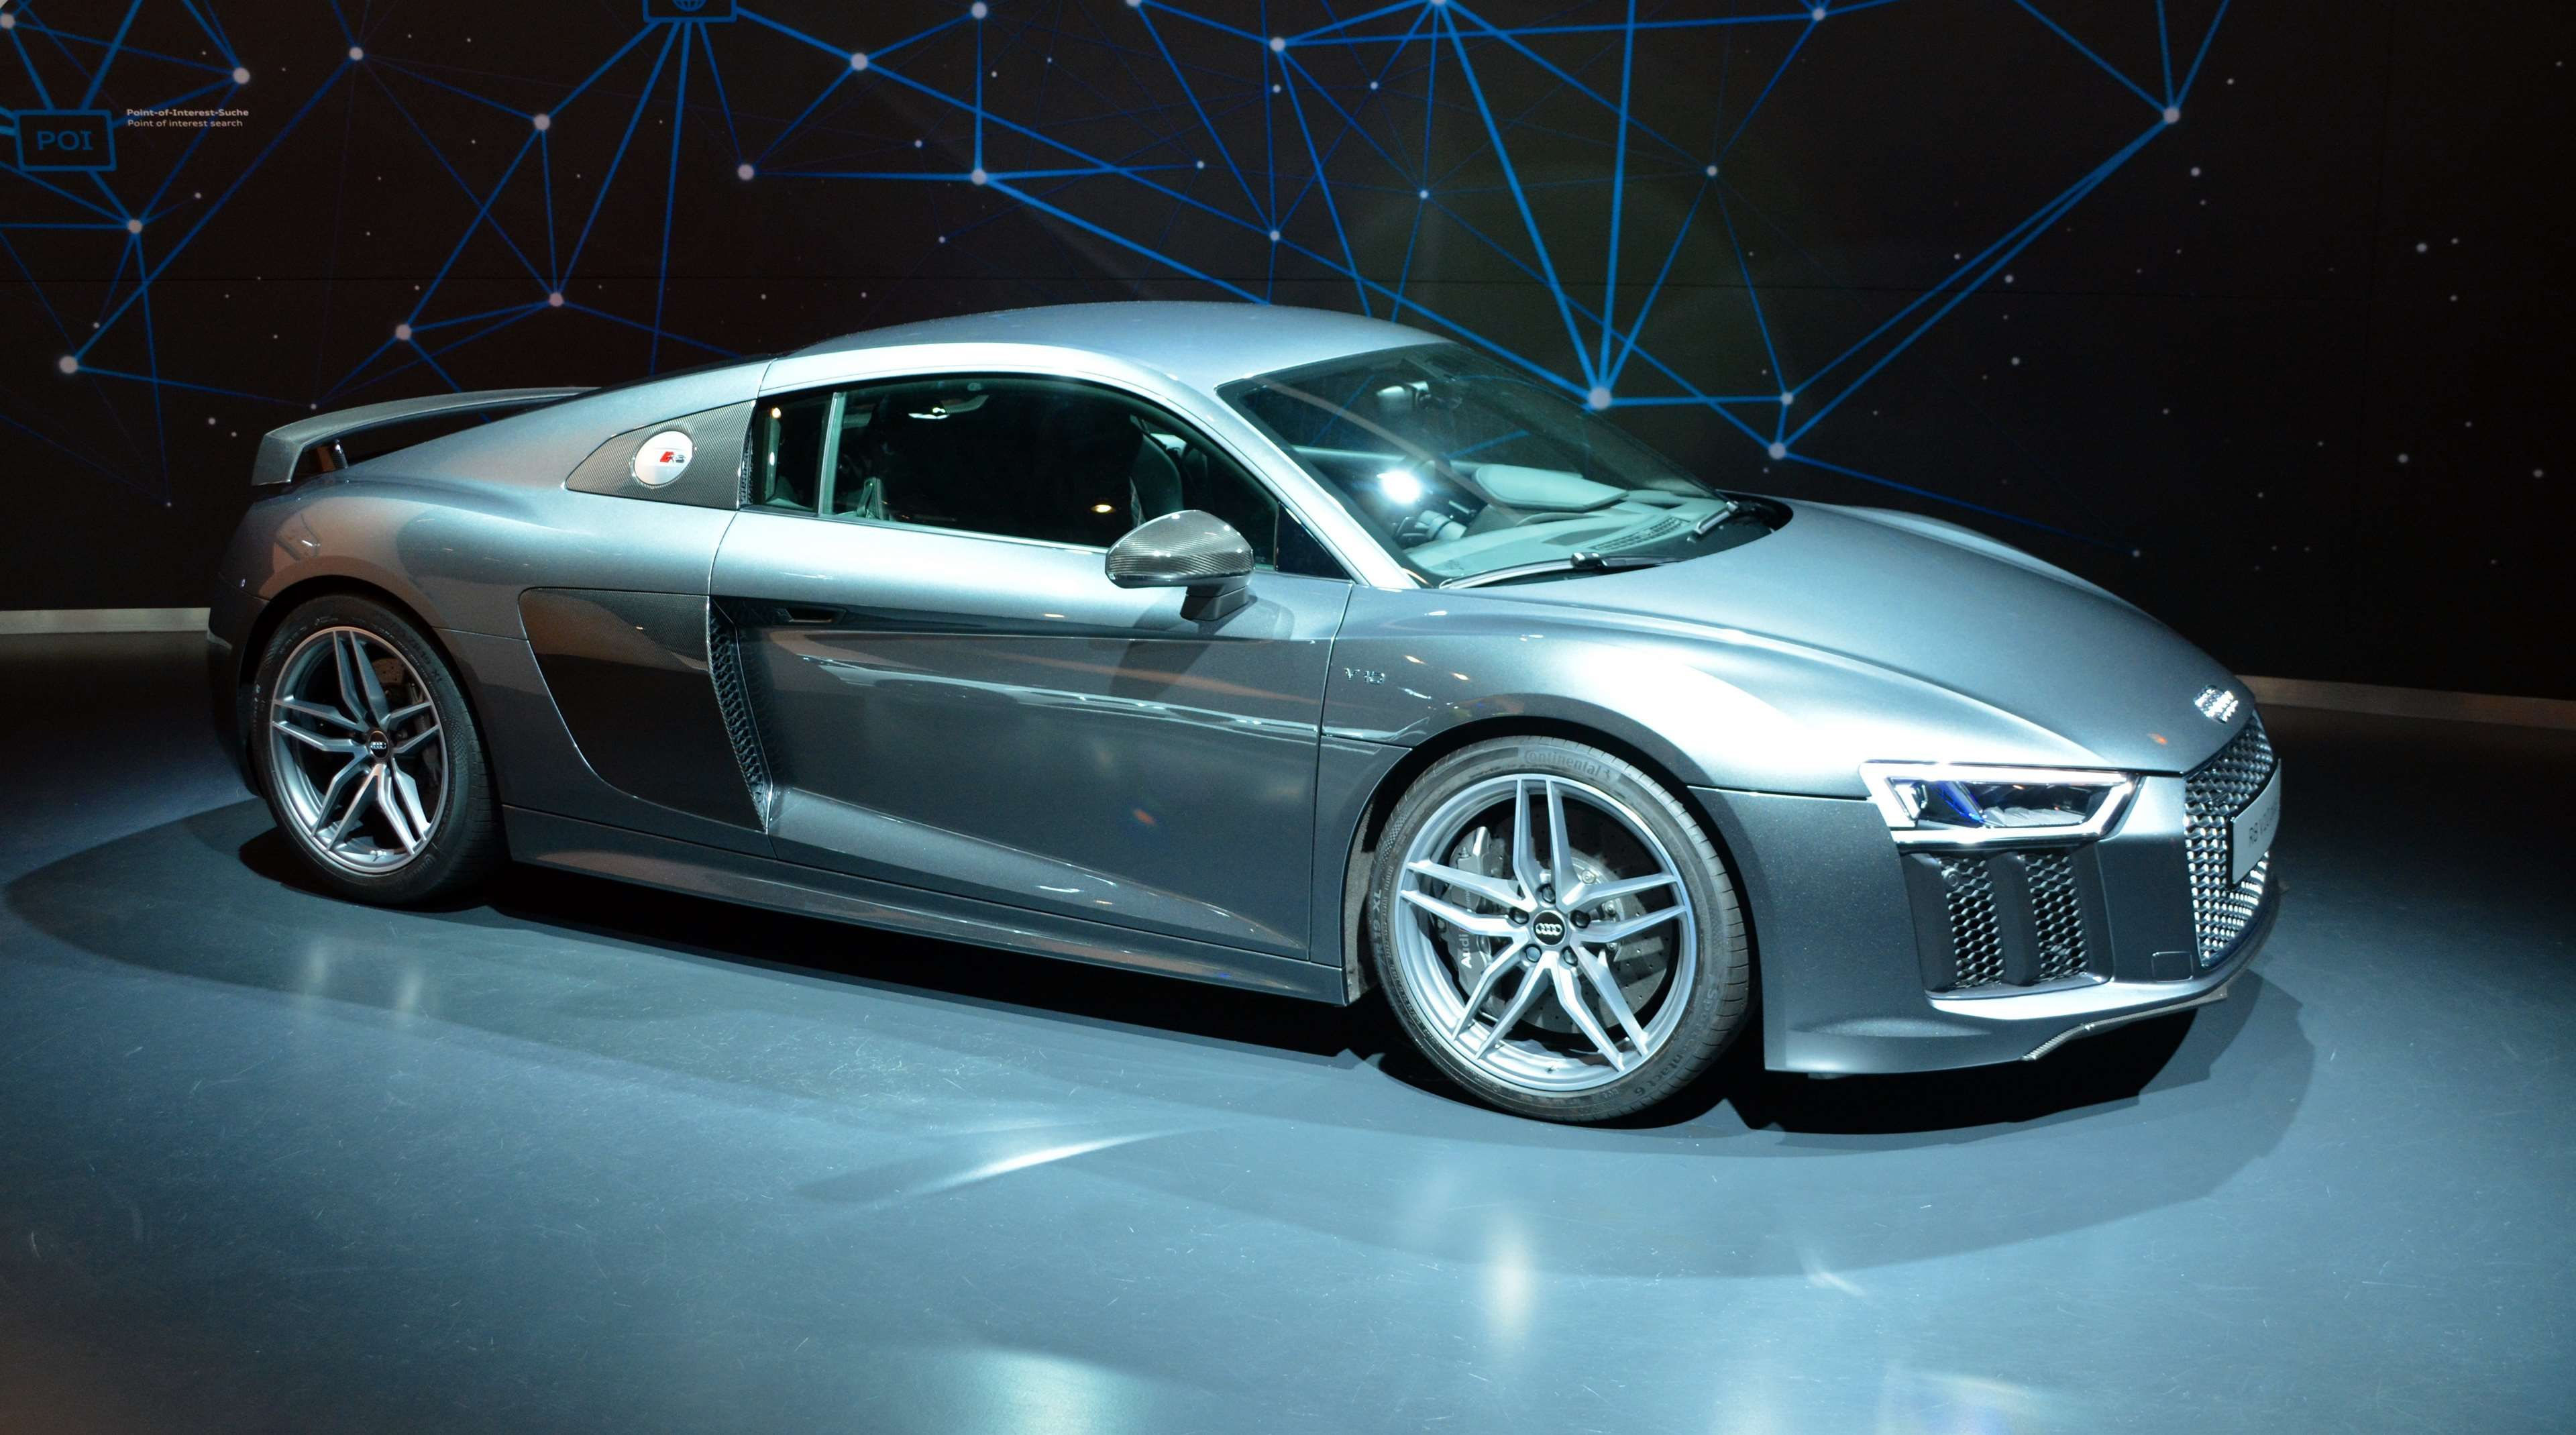 Marvelous 2017 Audi R8 2017 AUDI R8 (V10) CHARCOAL GRAY / BLACK S1524 | Car